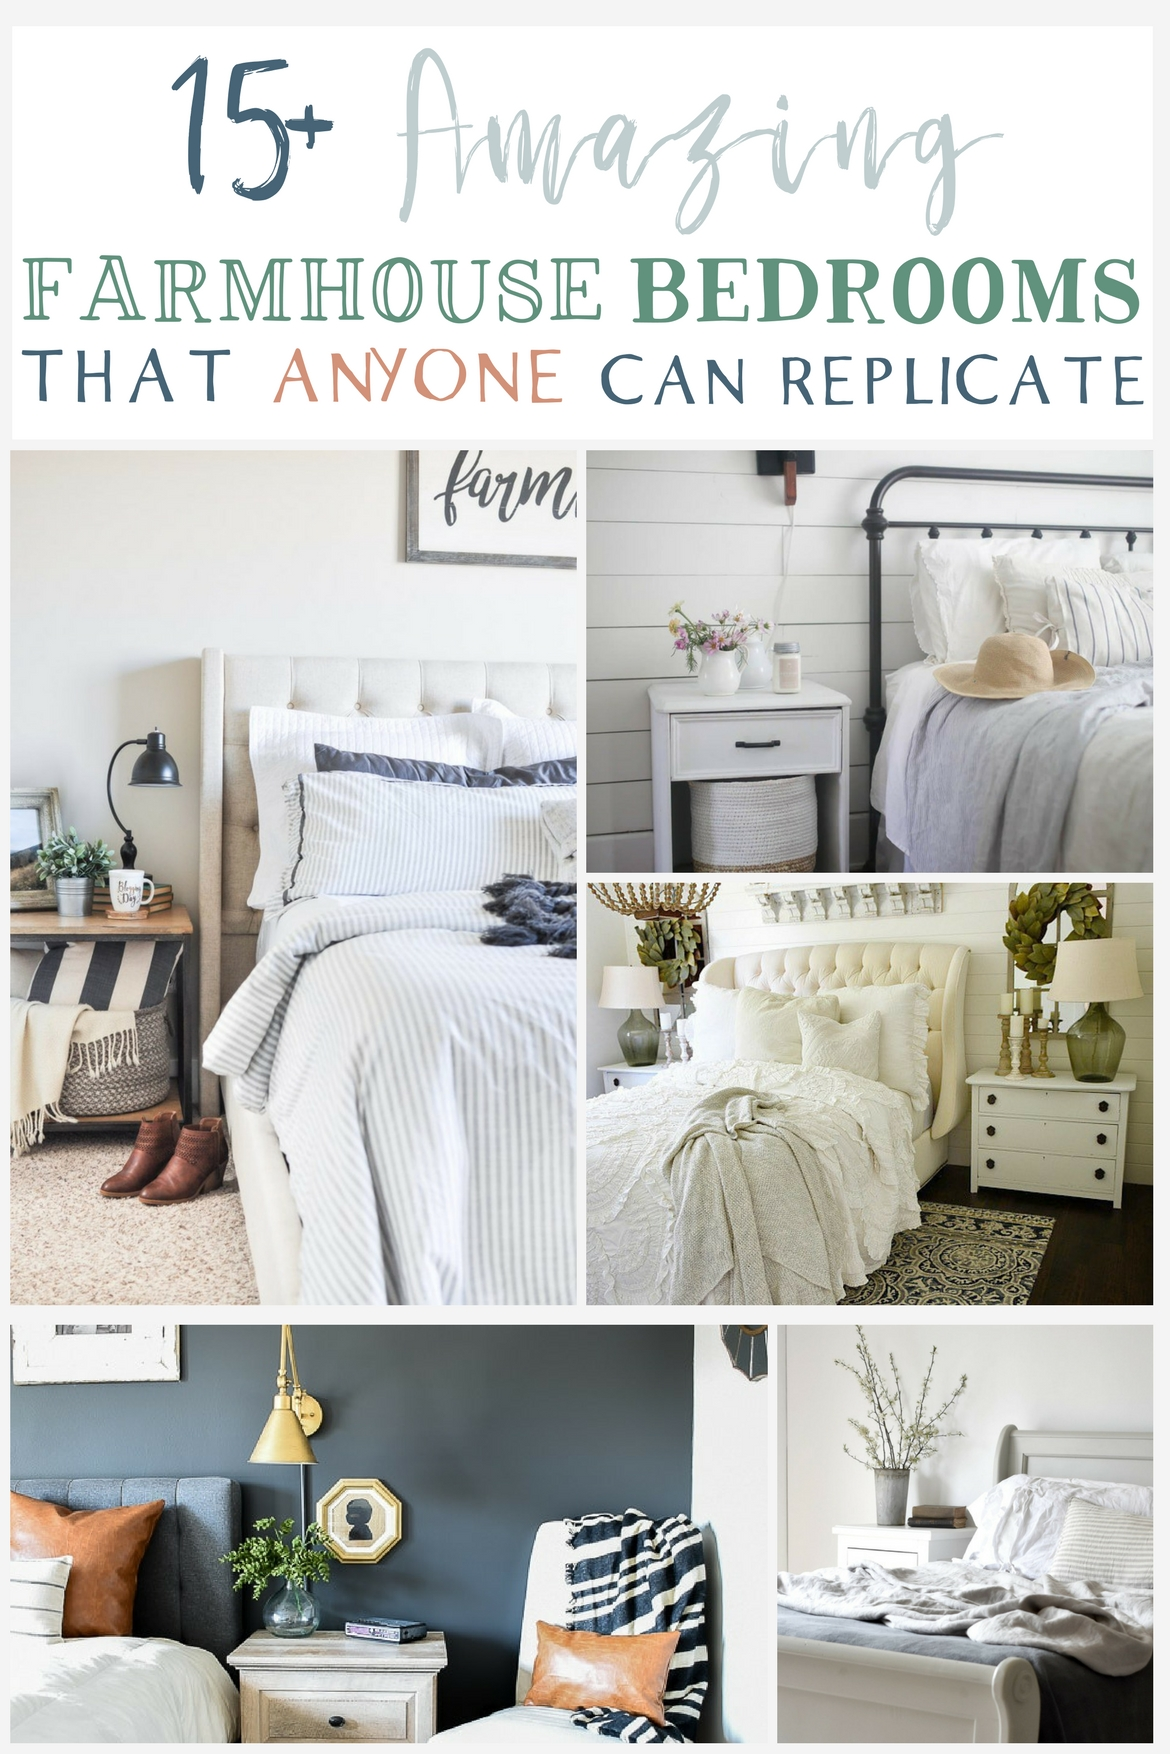 15 Farmhouse Bedroom Ideas Anyone Can Replicate The